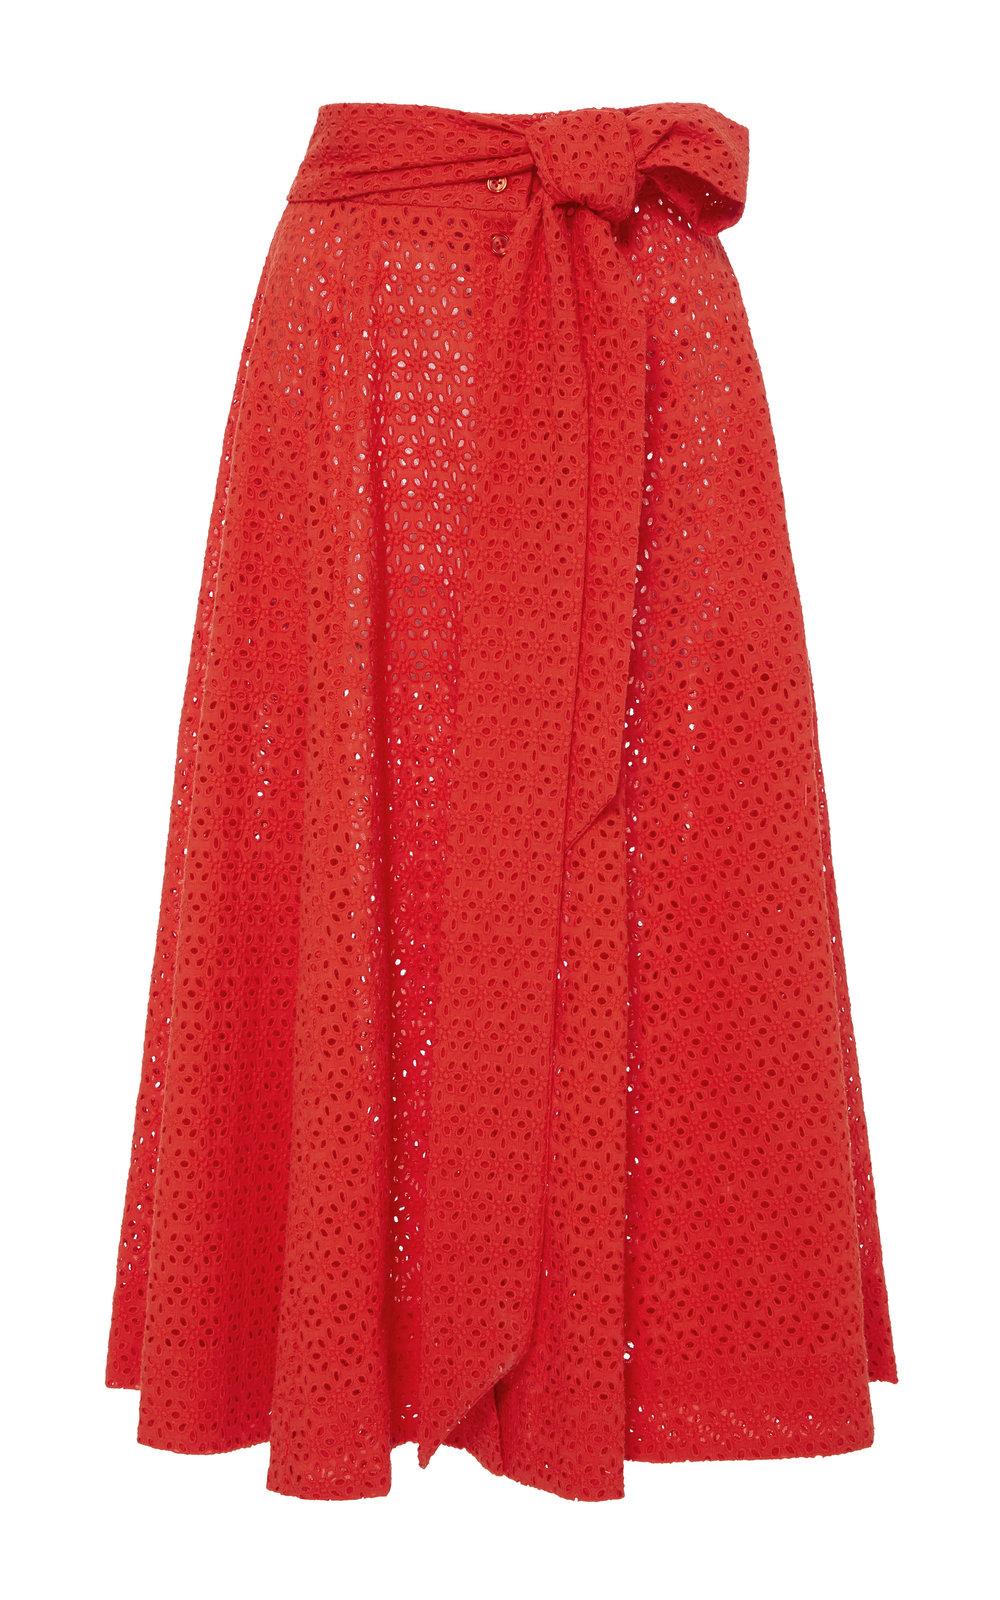 large_lisa-marie-fernandez-red-high-waist-eyelet-beach-skirt.jpg